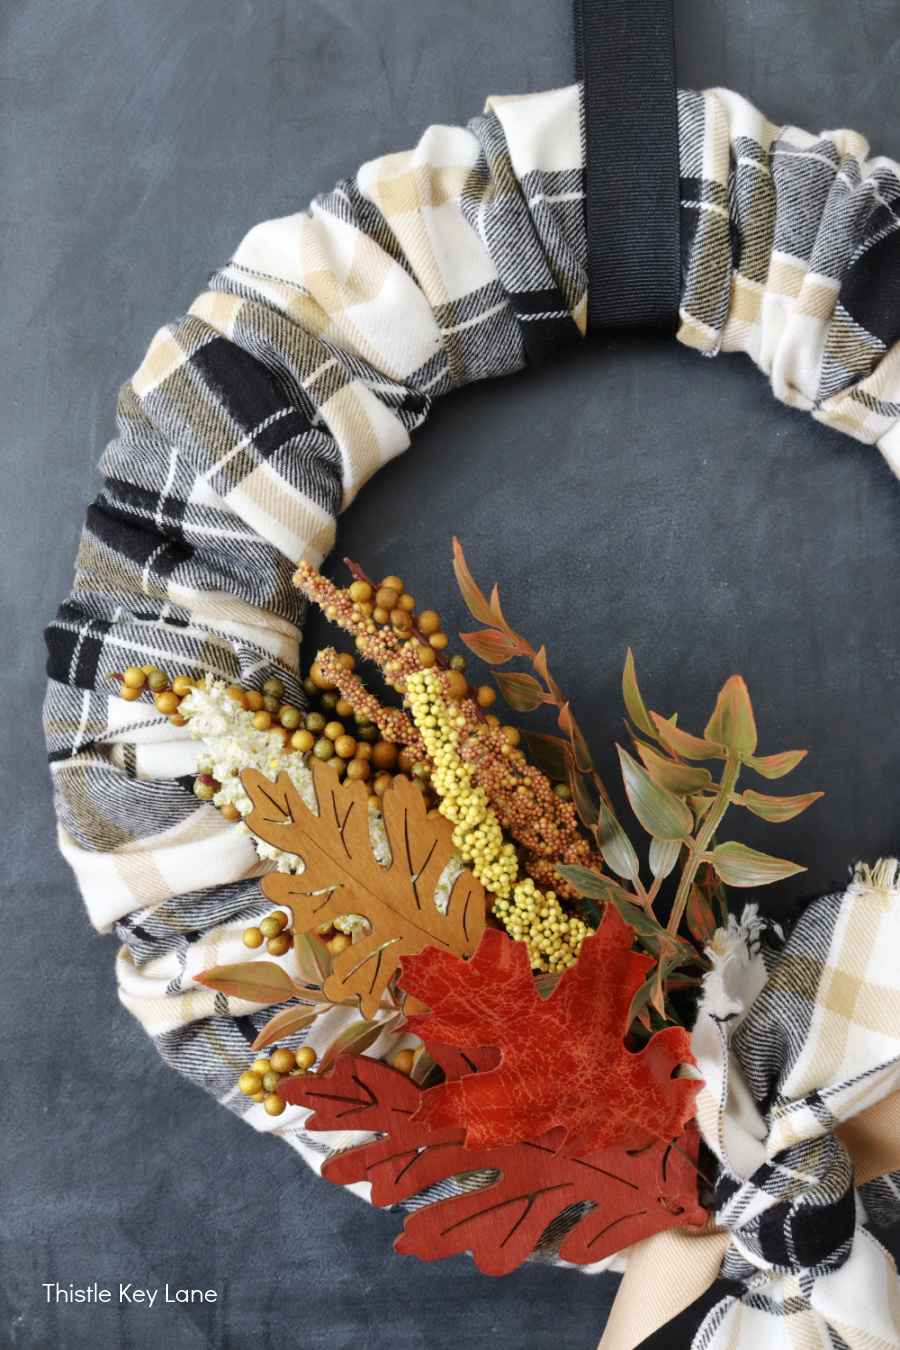 Fall leaves and foliage on a wreath. DIY Plaid Fall Wreath With Autumn Colors.